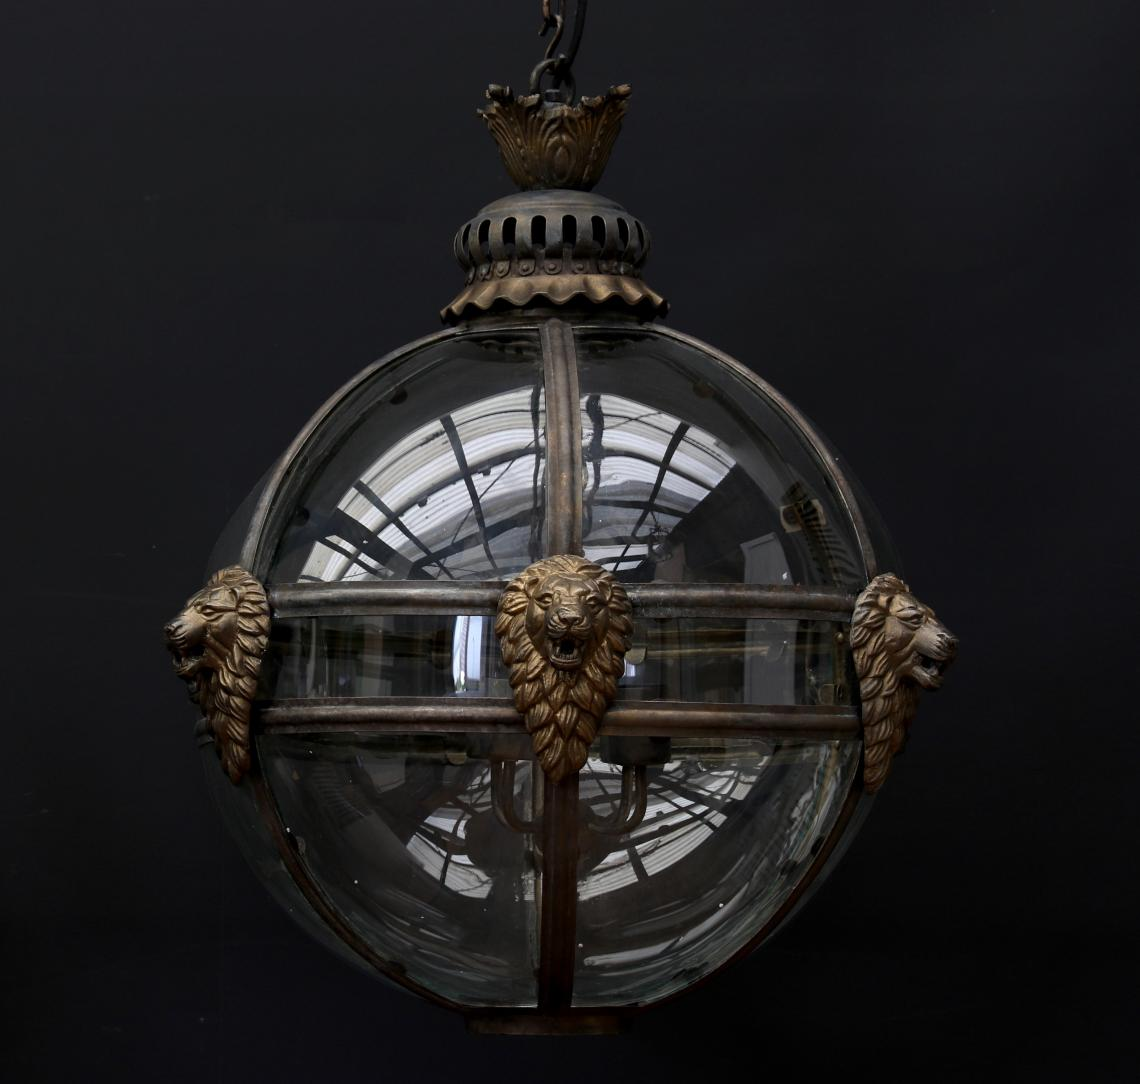 Spherical Globe Lion Lantern